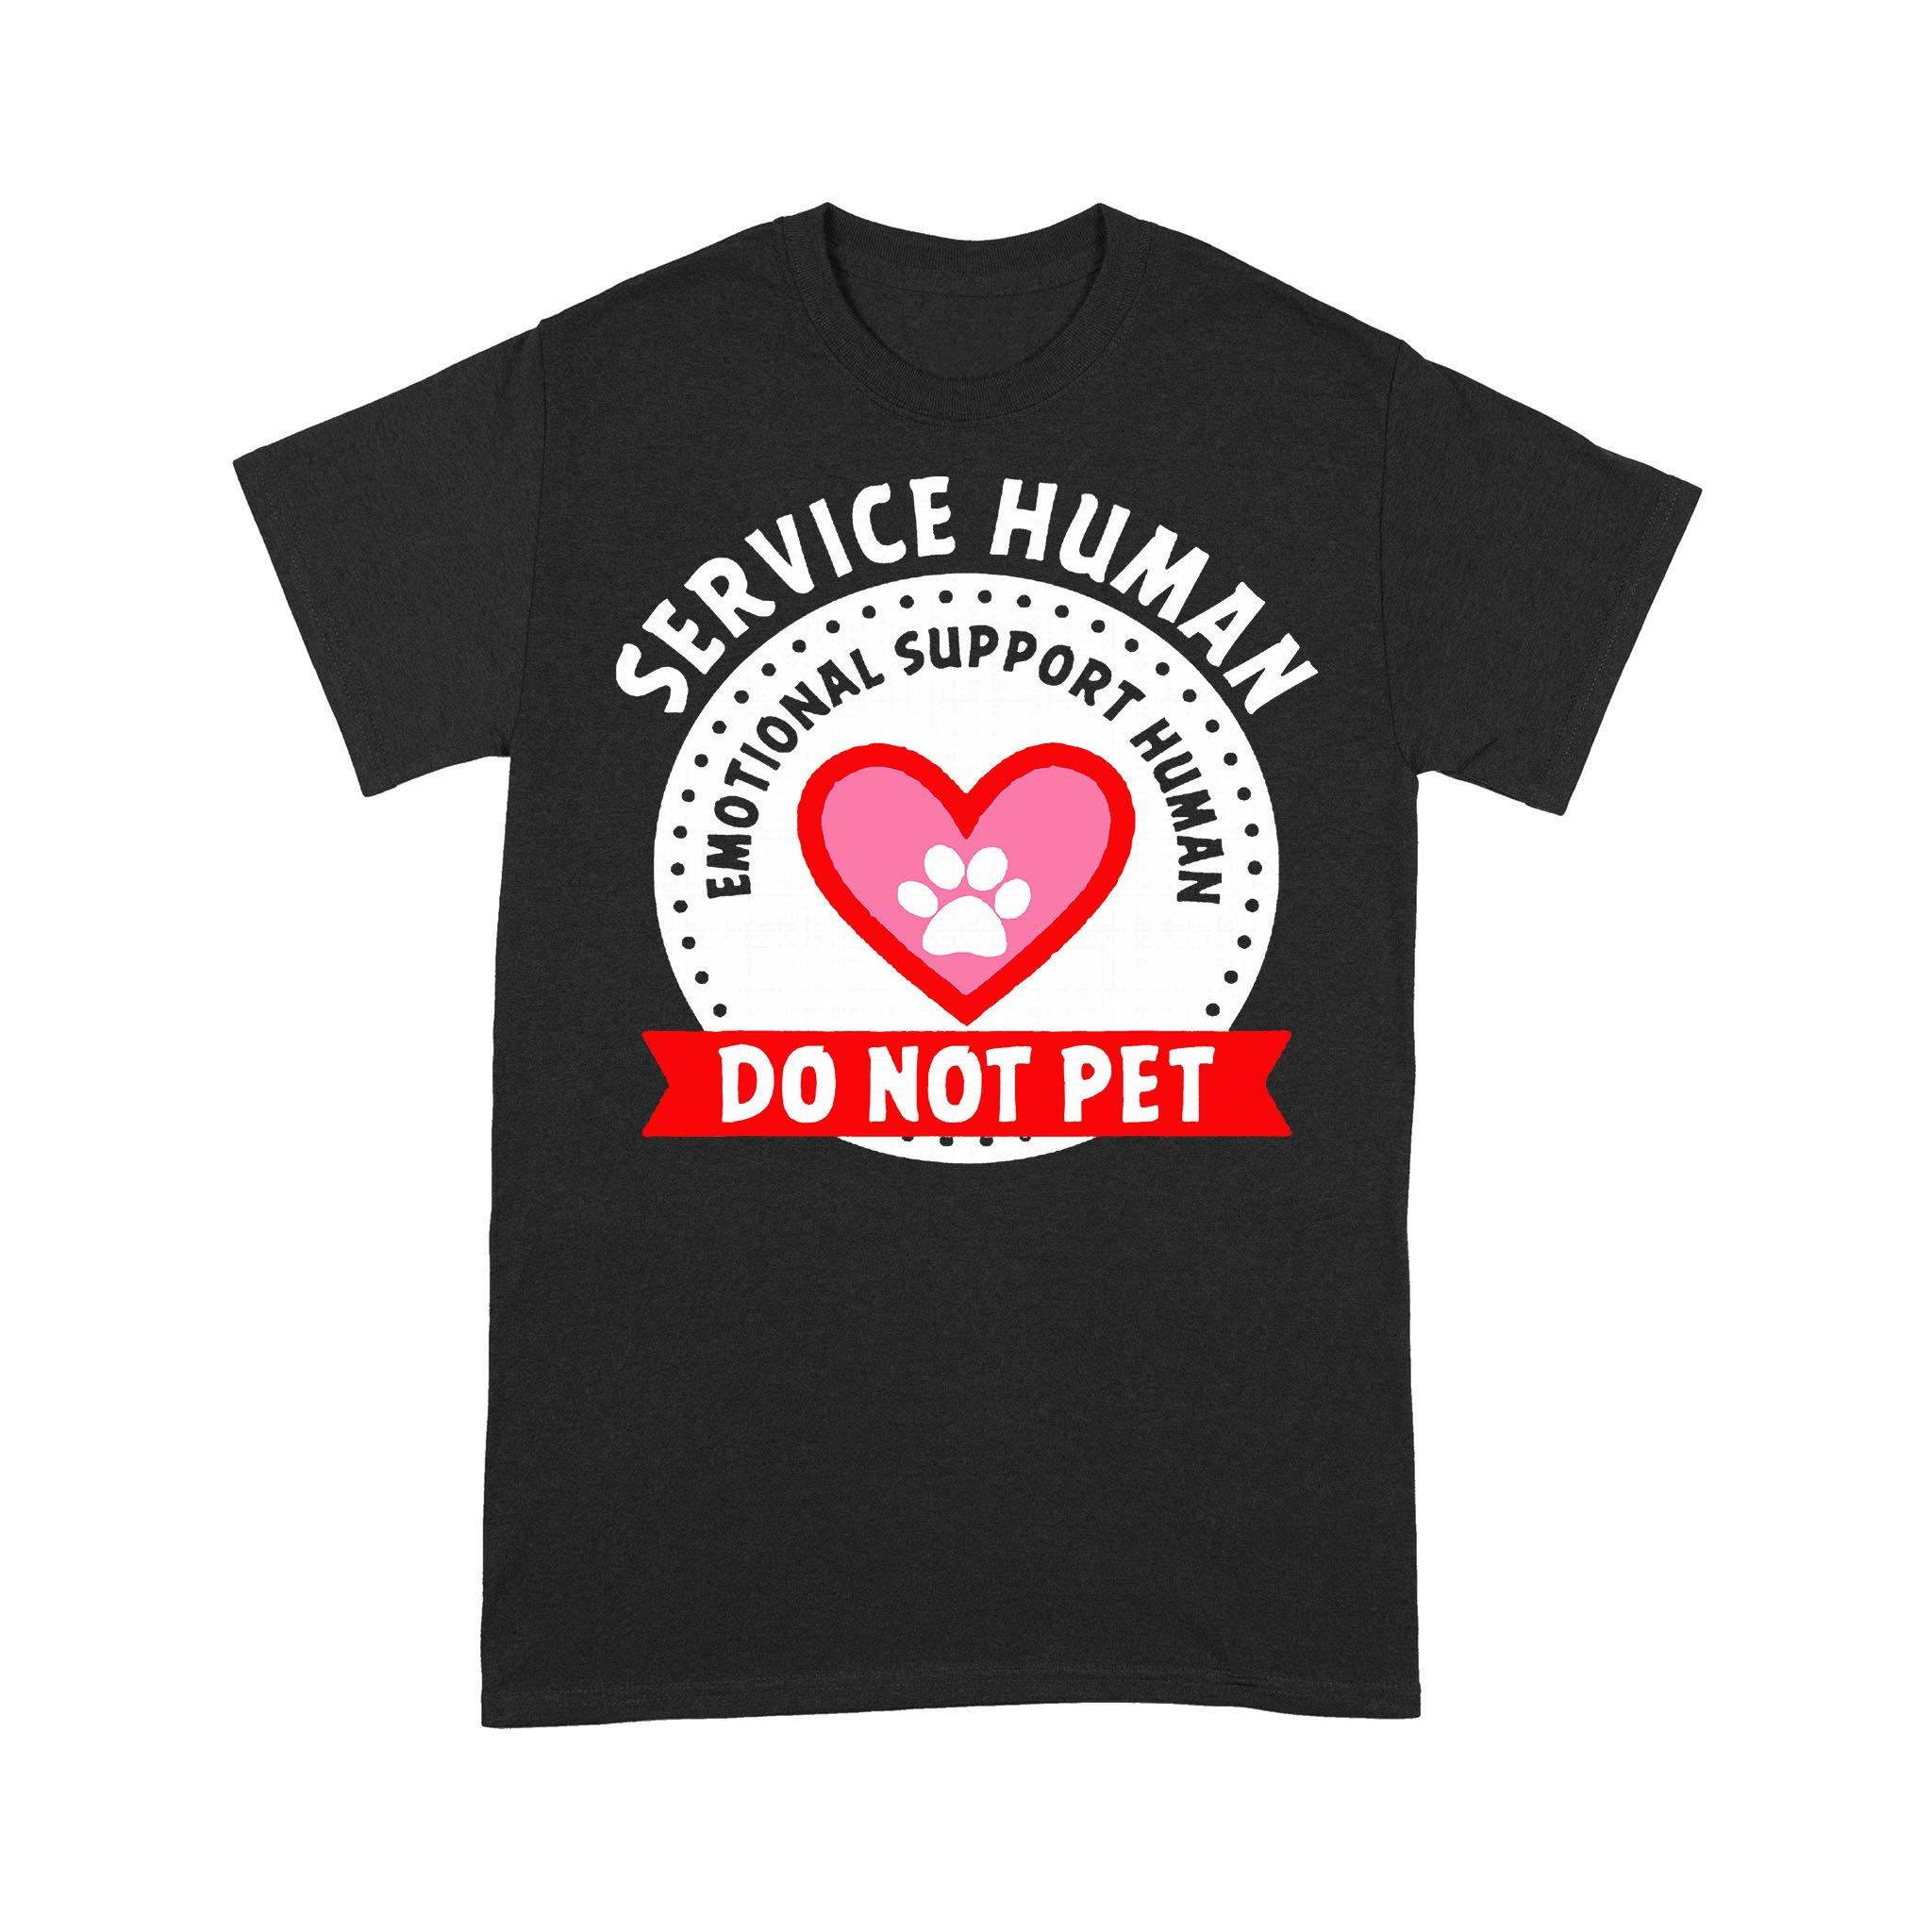 Dog Paw Service Human Emotional Support Do Not Pet T-shirt